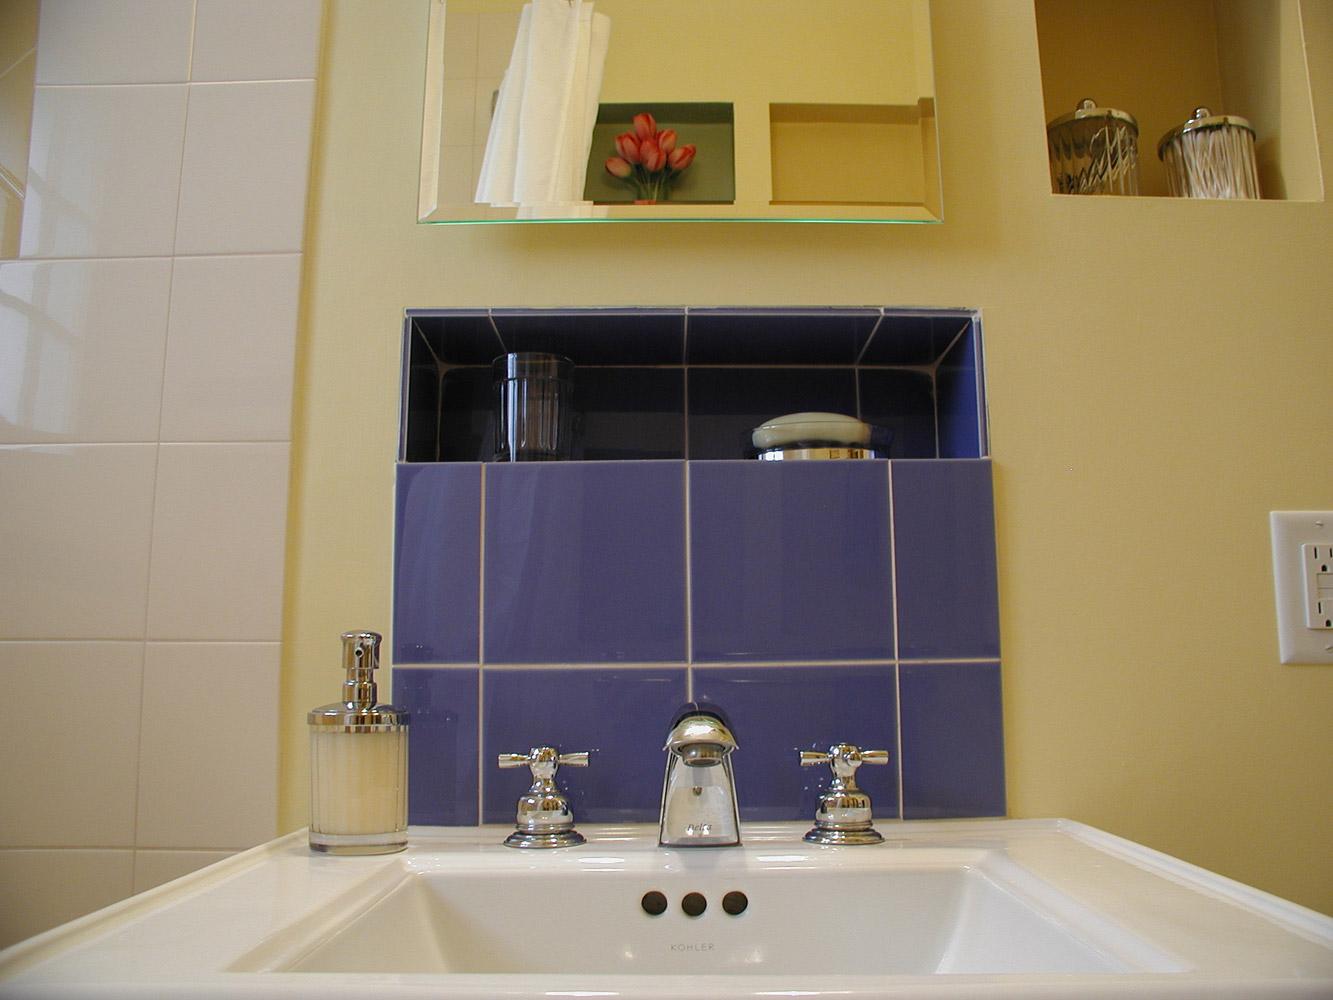 Shampoo niche design tips protradecraft bau sink 1g dailygadgetfo Images